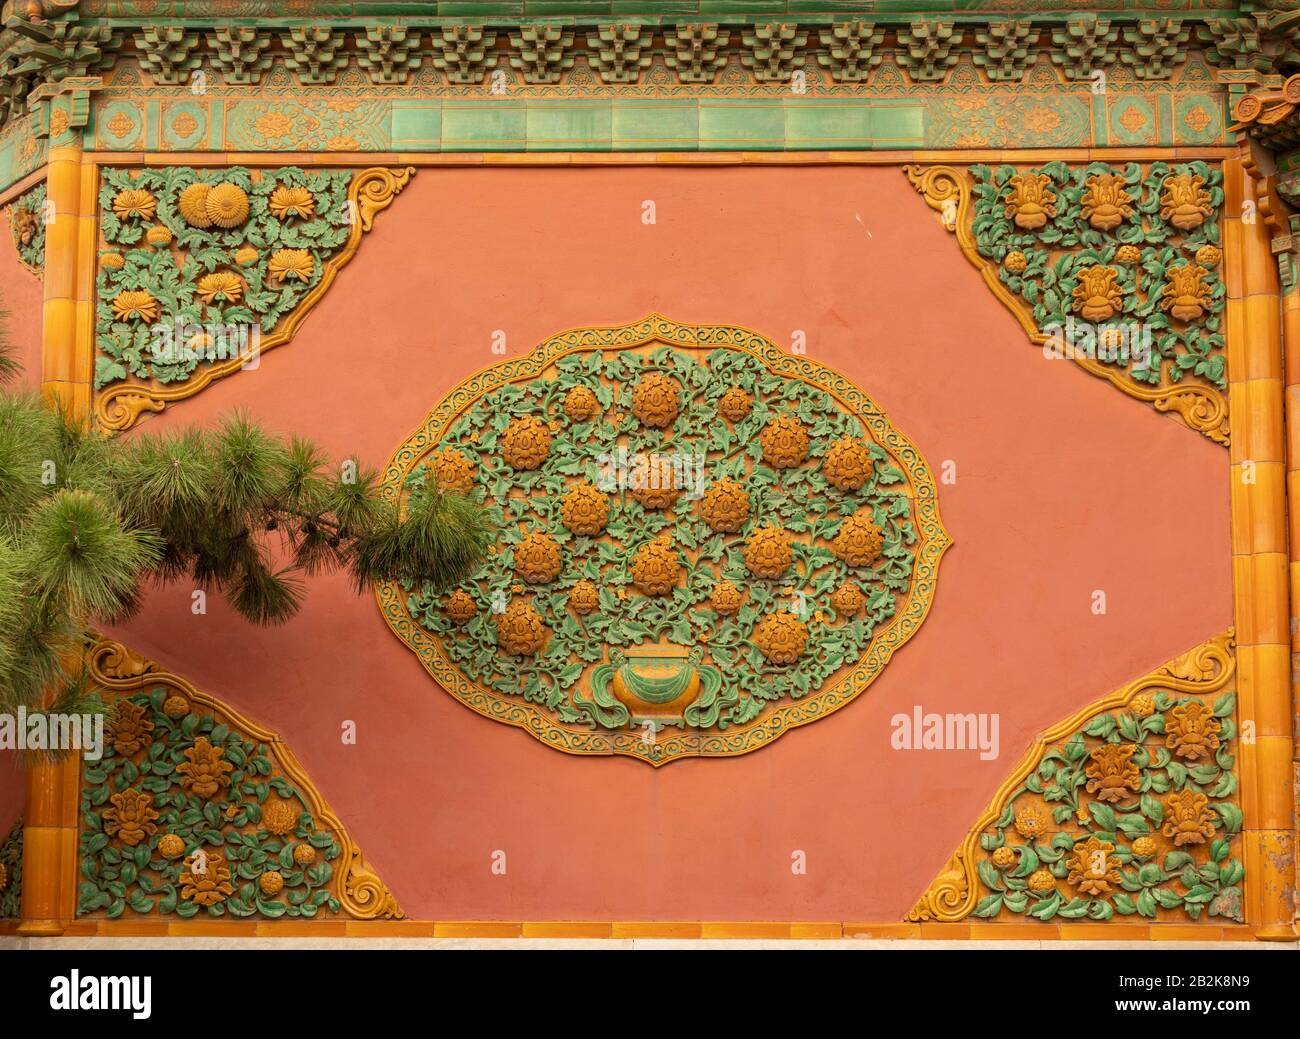 The Forbidden City, Beijing, China Stock Photo